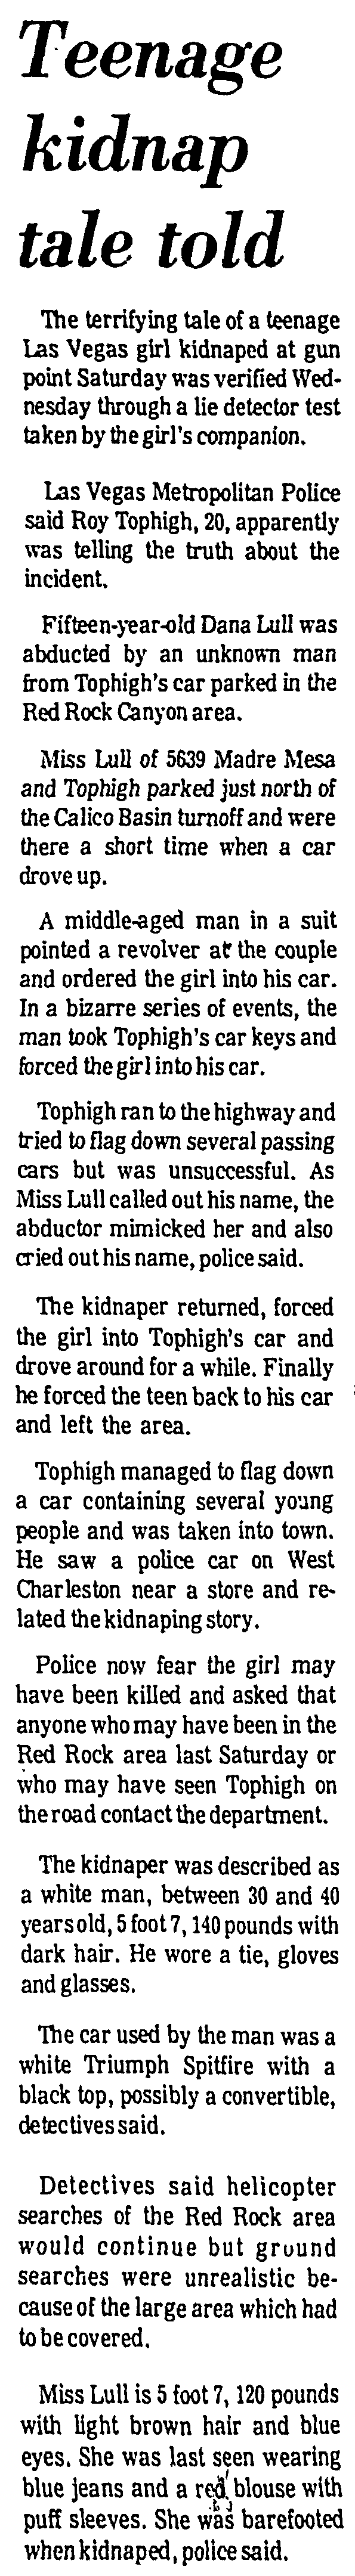 Las_Vegas_Review-Journal_1974-05-02_1